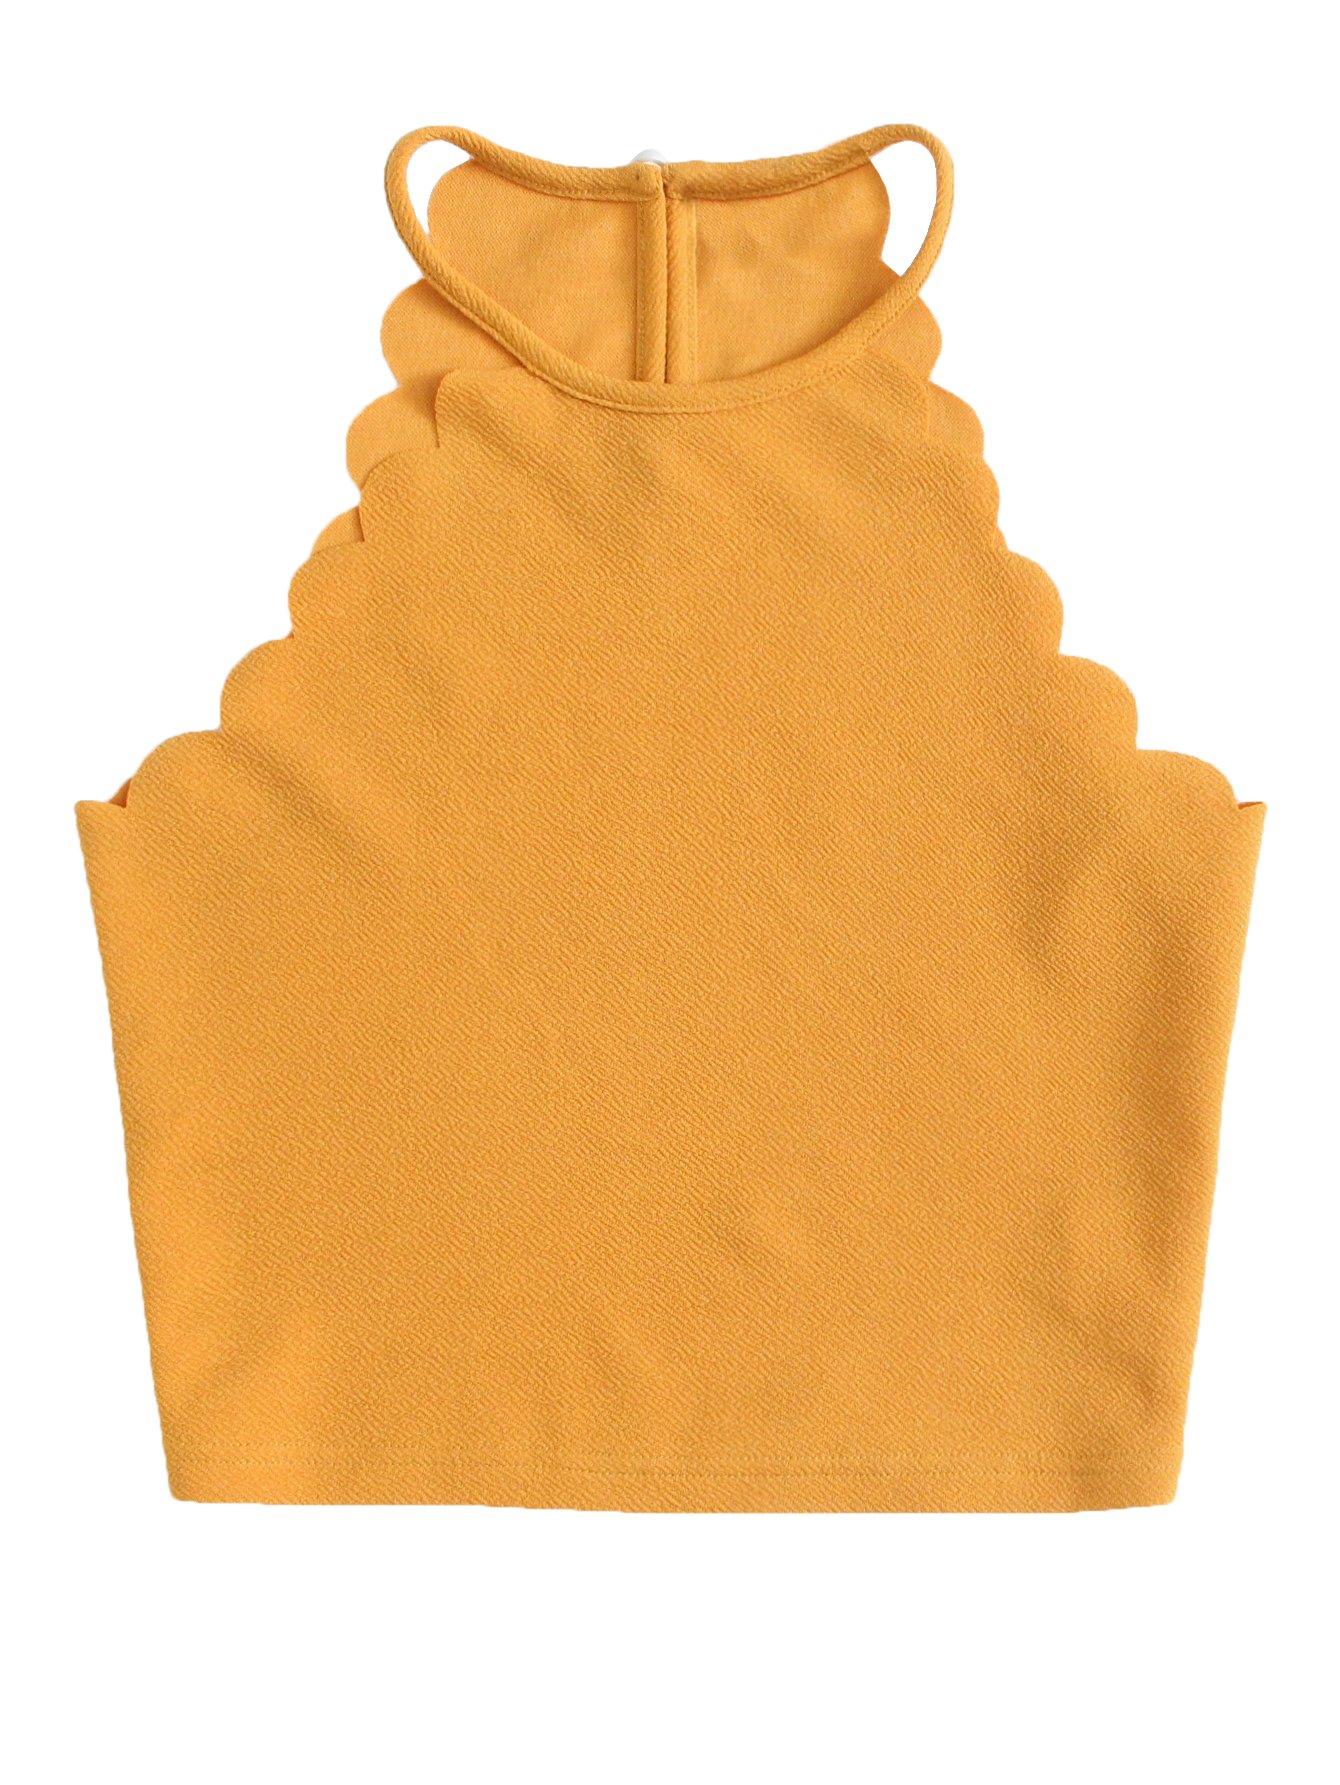 MakeMeChic Women's Solid Halter Neck Cami Scallop Trim Workout Crop Top Yellow S